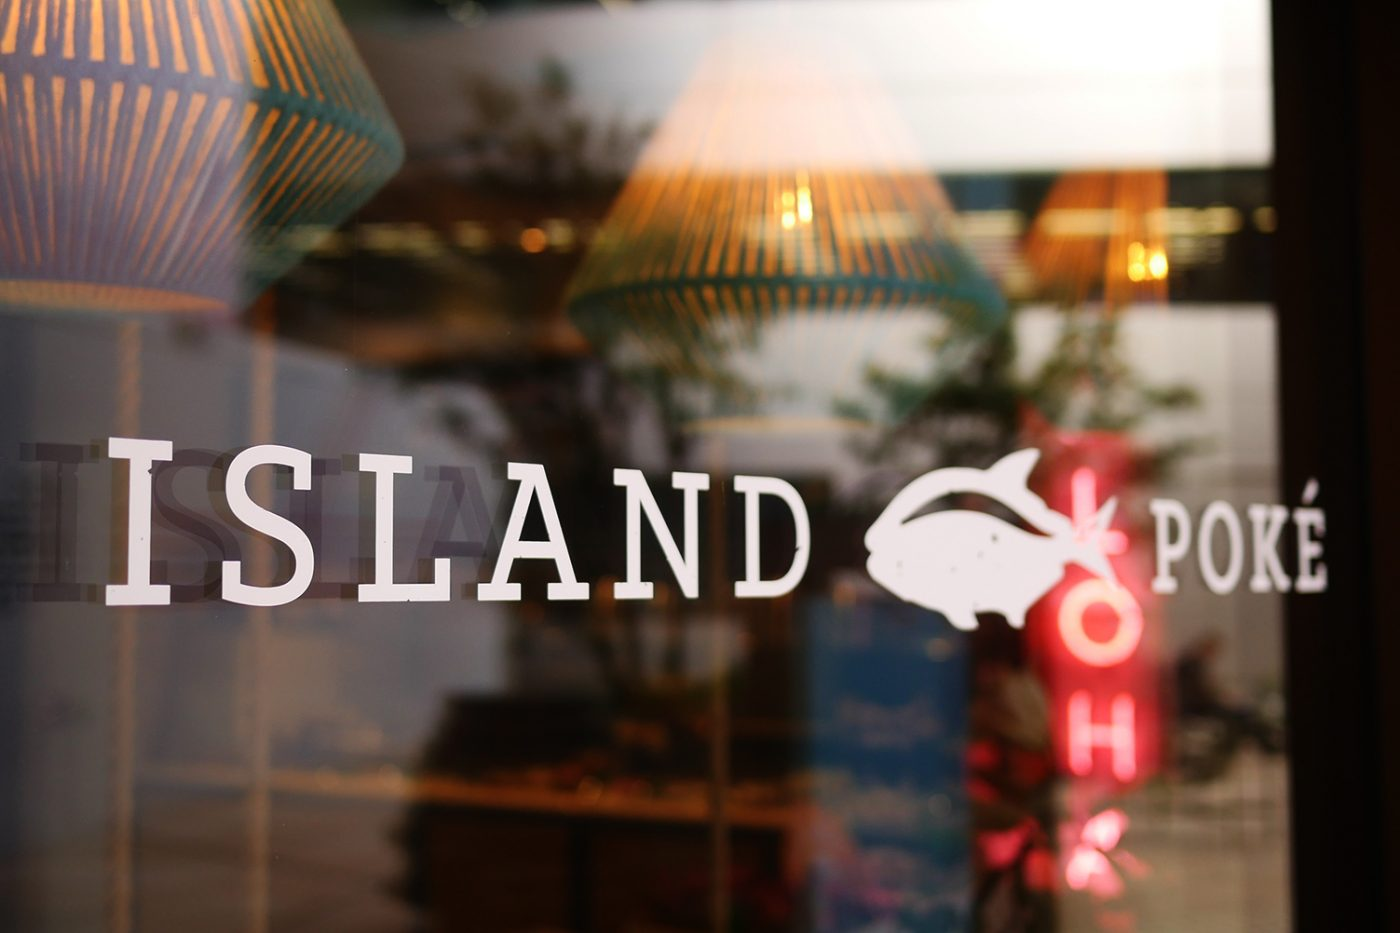 island-poke-decal-logo-window-sign-graphic-design-london-broadgate-hawaiian